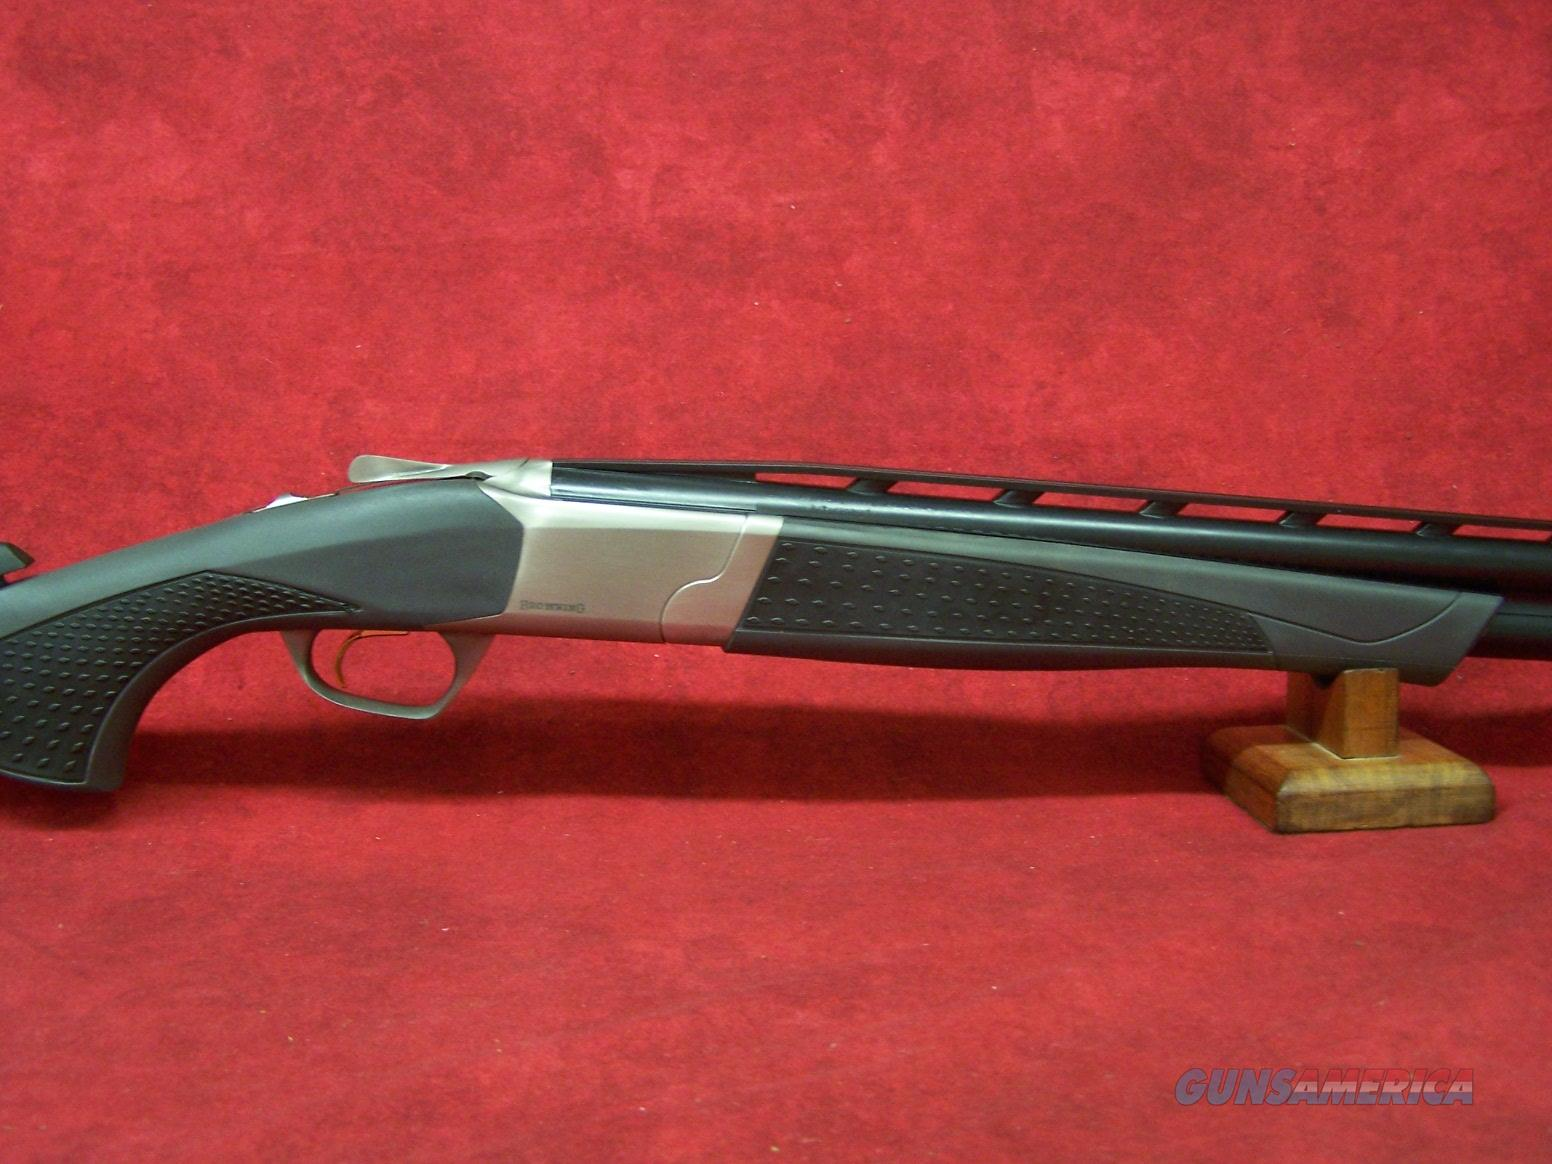 "Browning Cynergy CX Composite 12ga 30"" (018710303)  Guns > Shotguns > Browning Shotguns > Over Unders > Cynergy > Trap/Skeet"